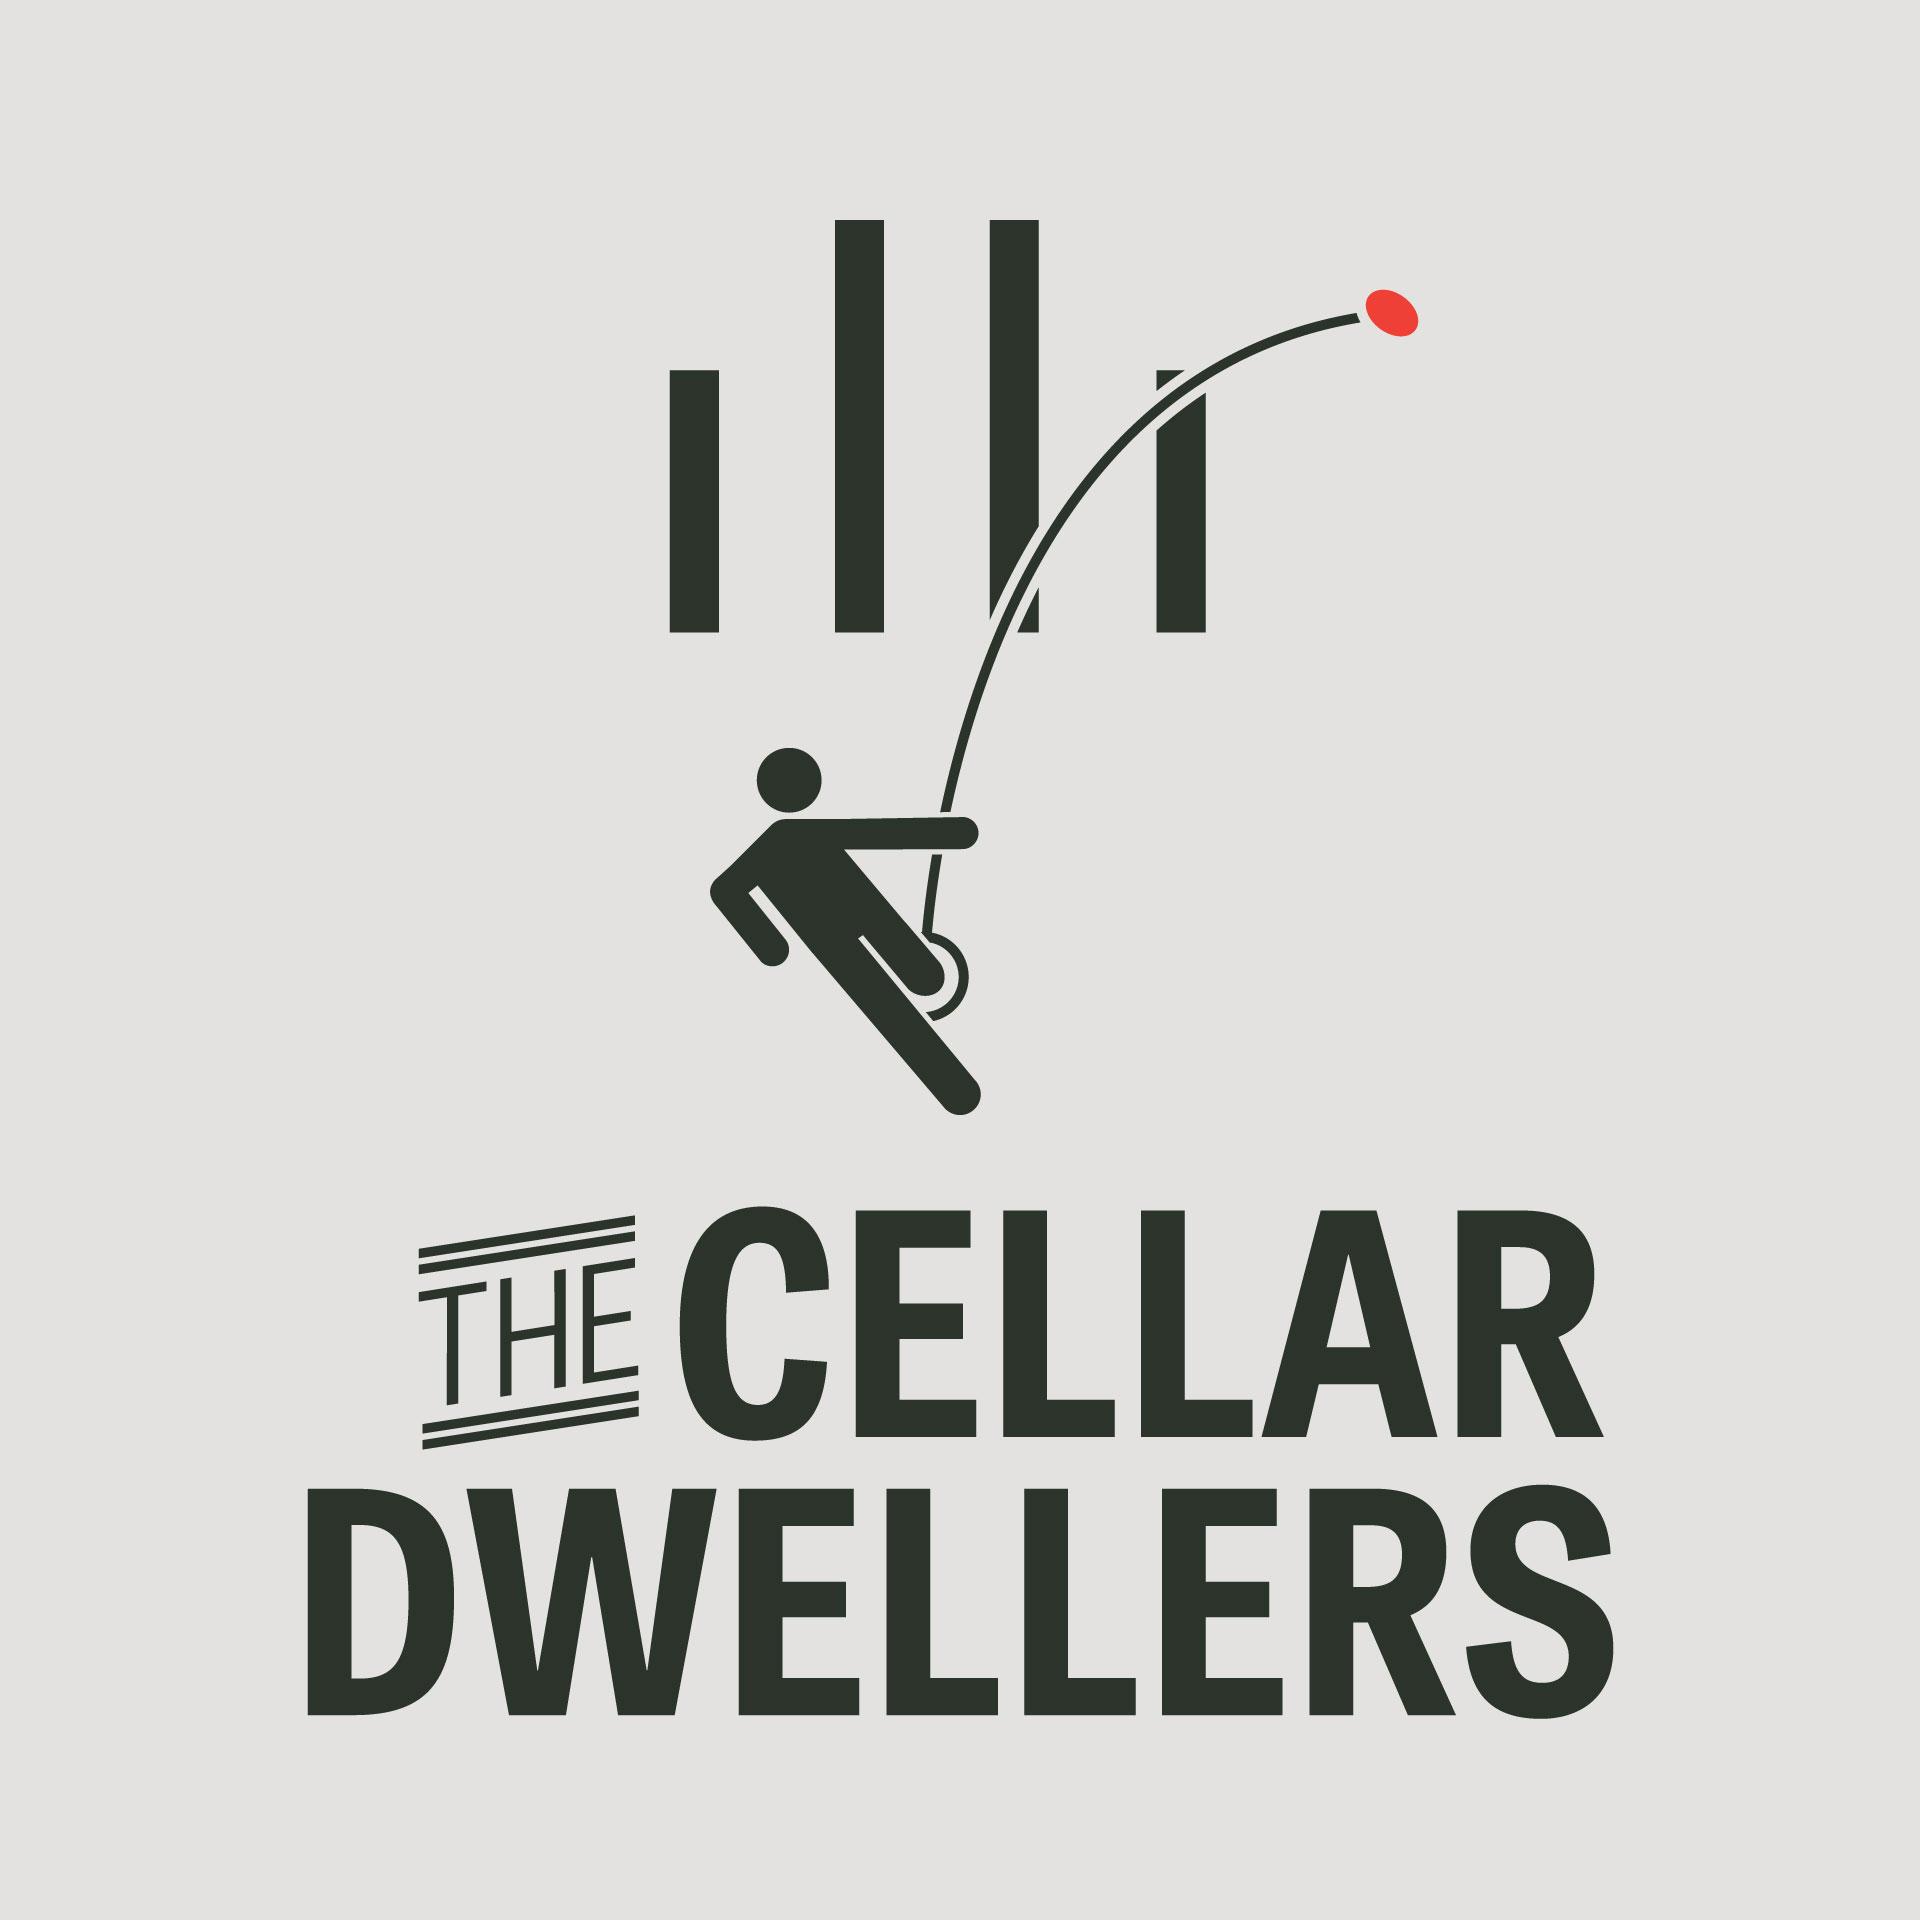 The-Cellar-Dwellers_white.jpg